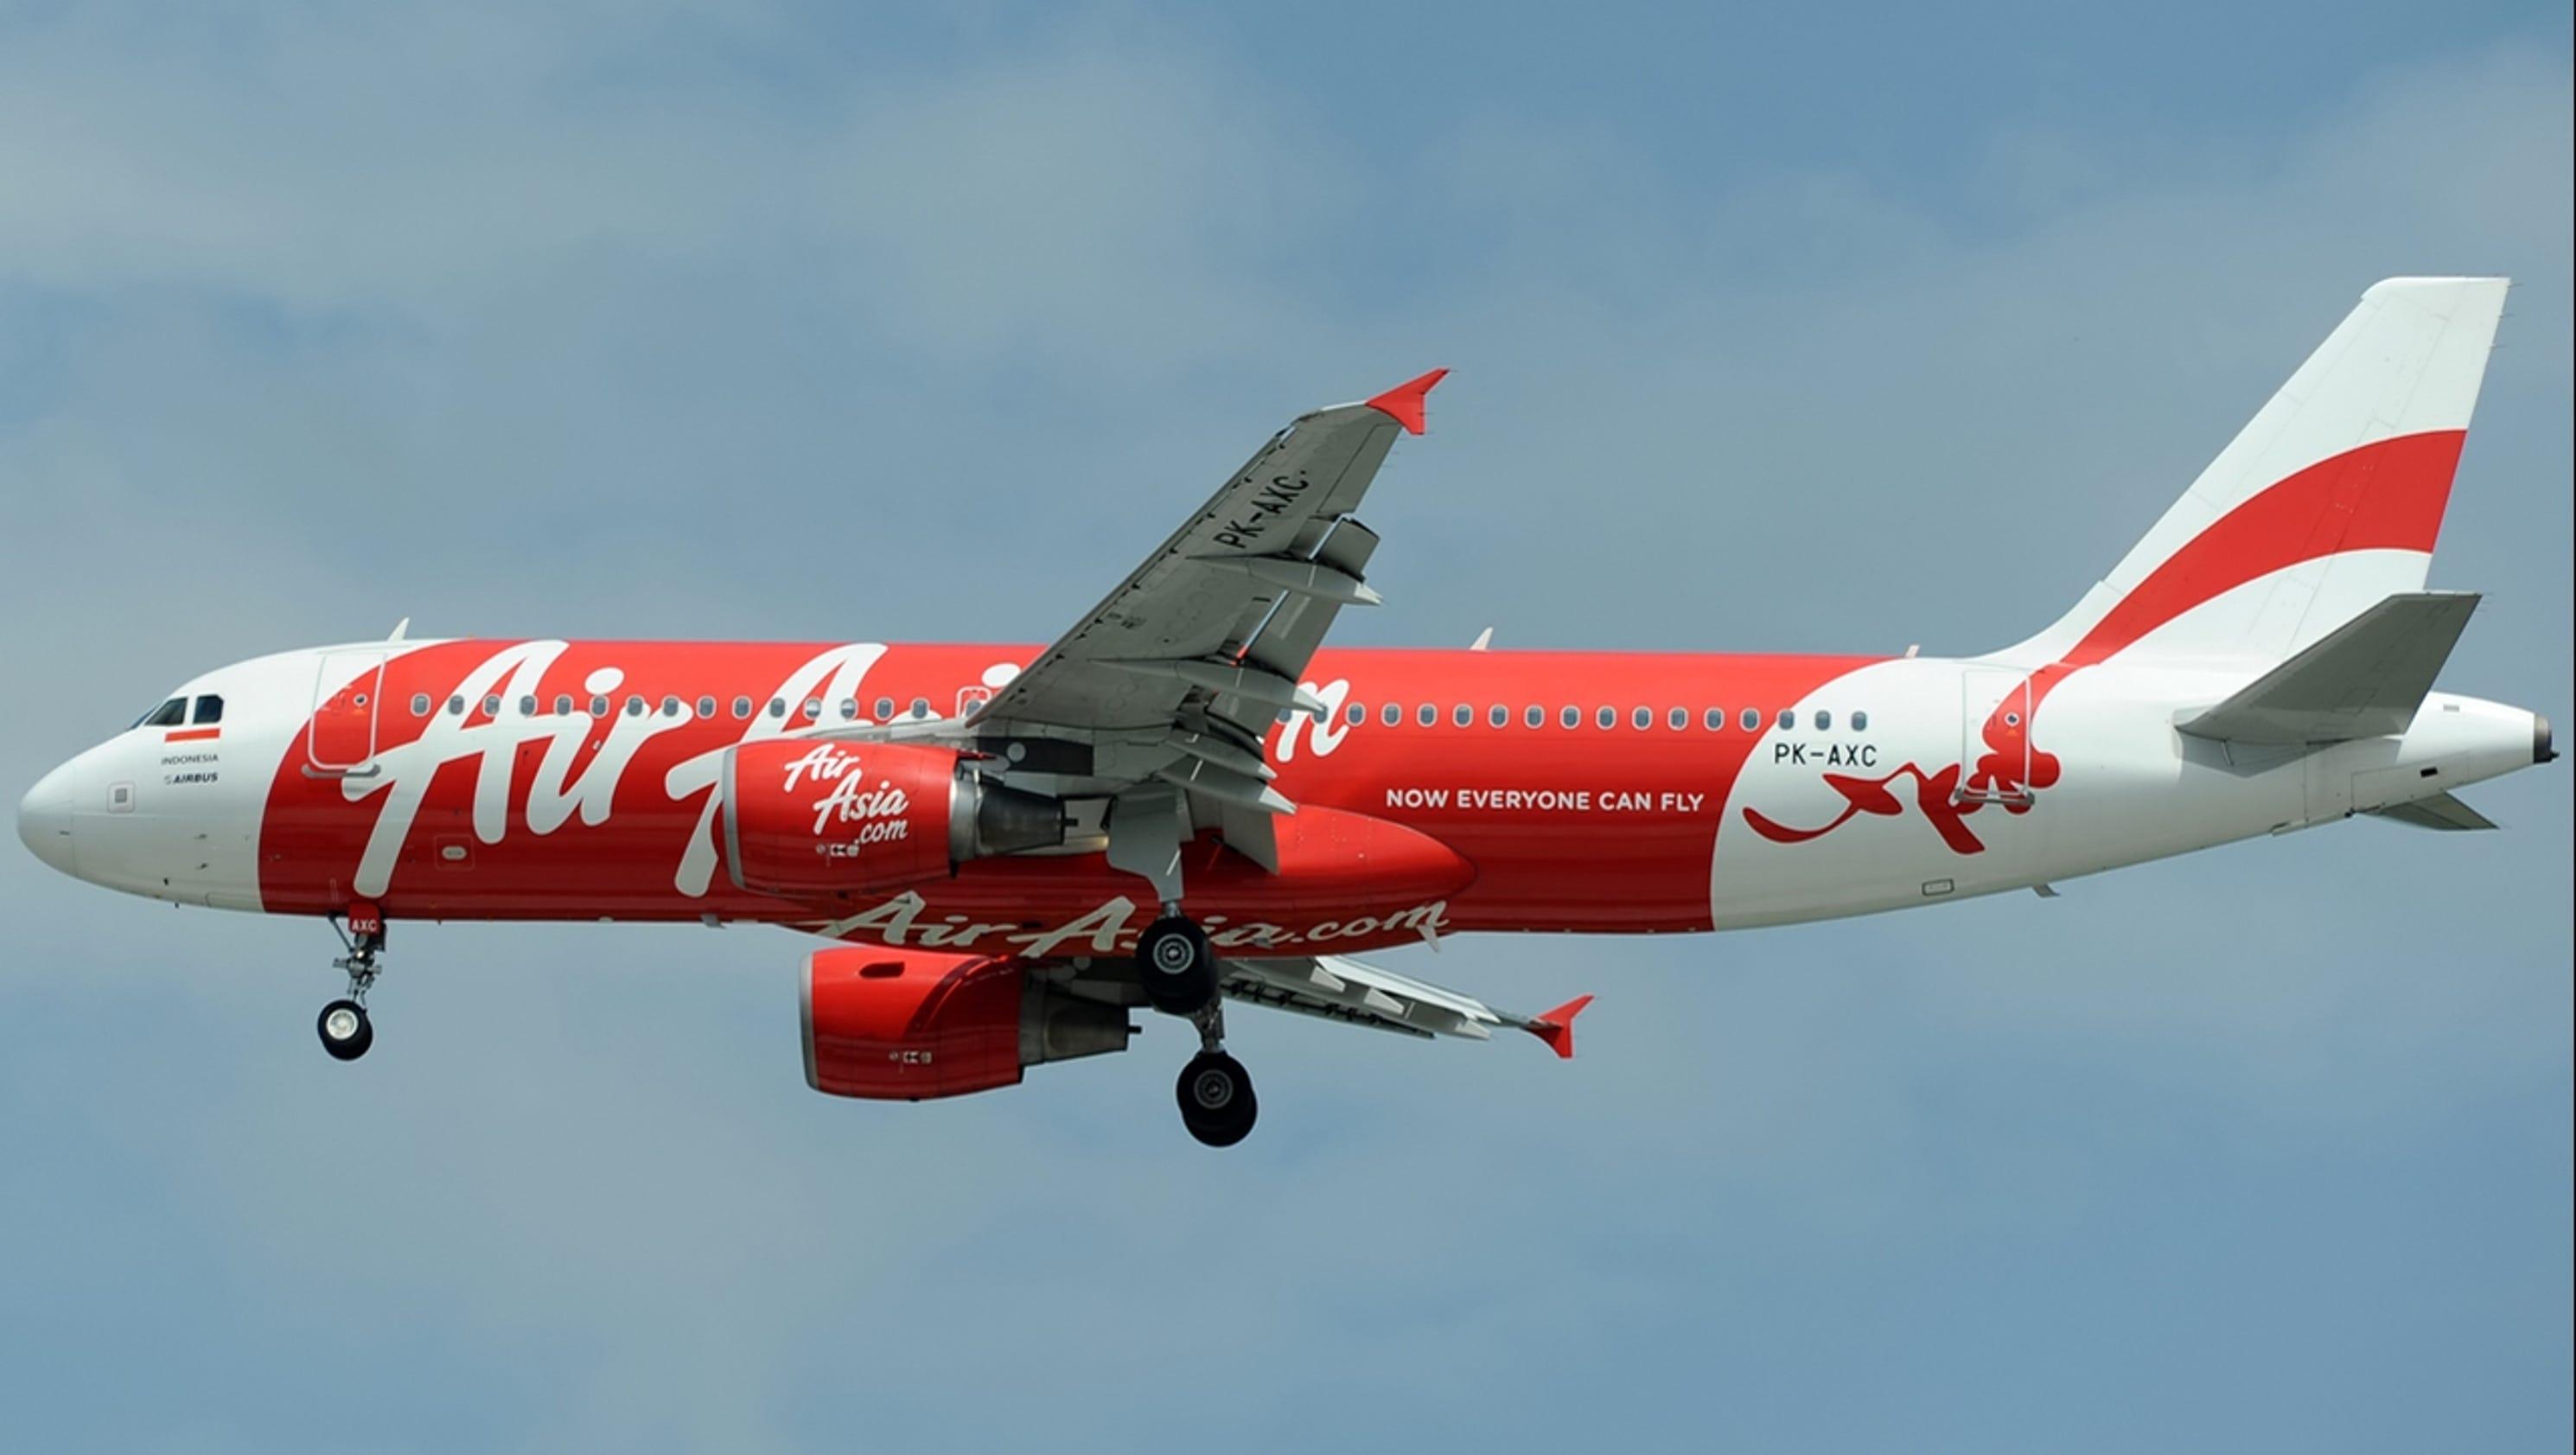 AirAsia Allstars - Can't Stop The Feeling - ONEAirAsia FUN ...